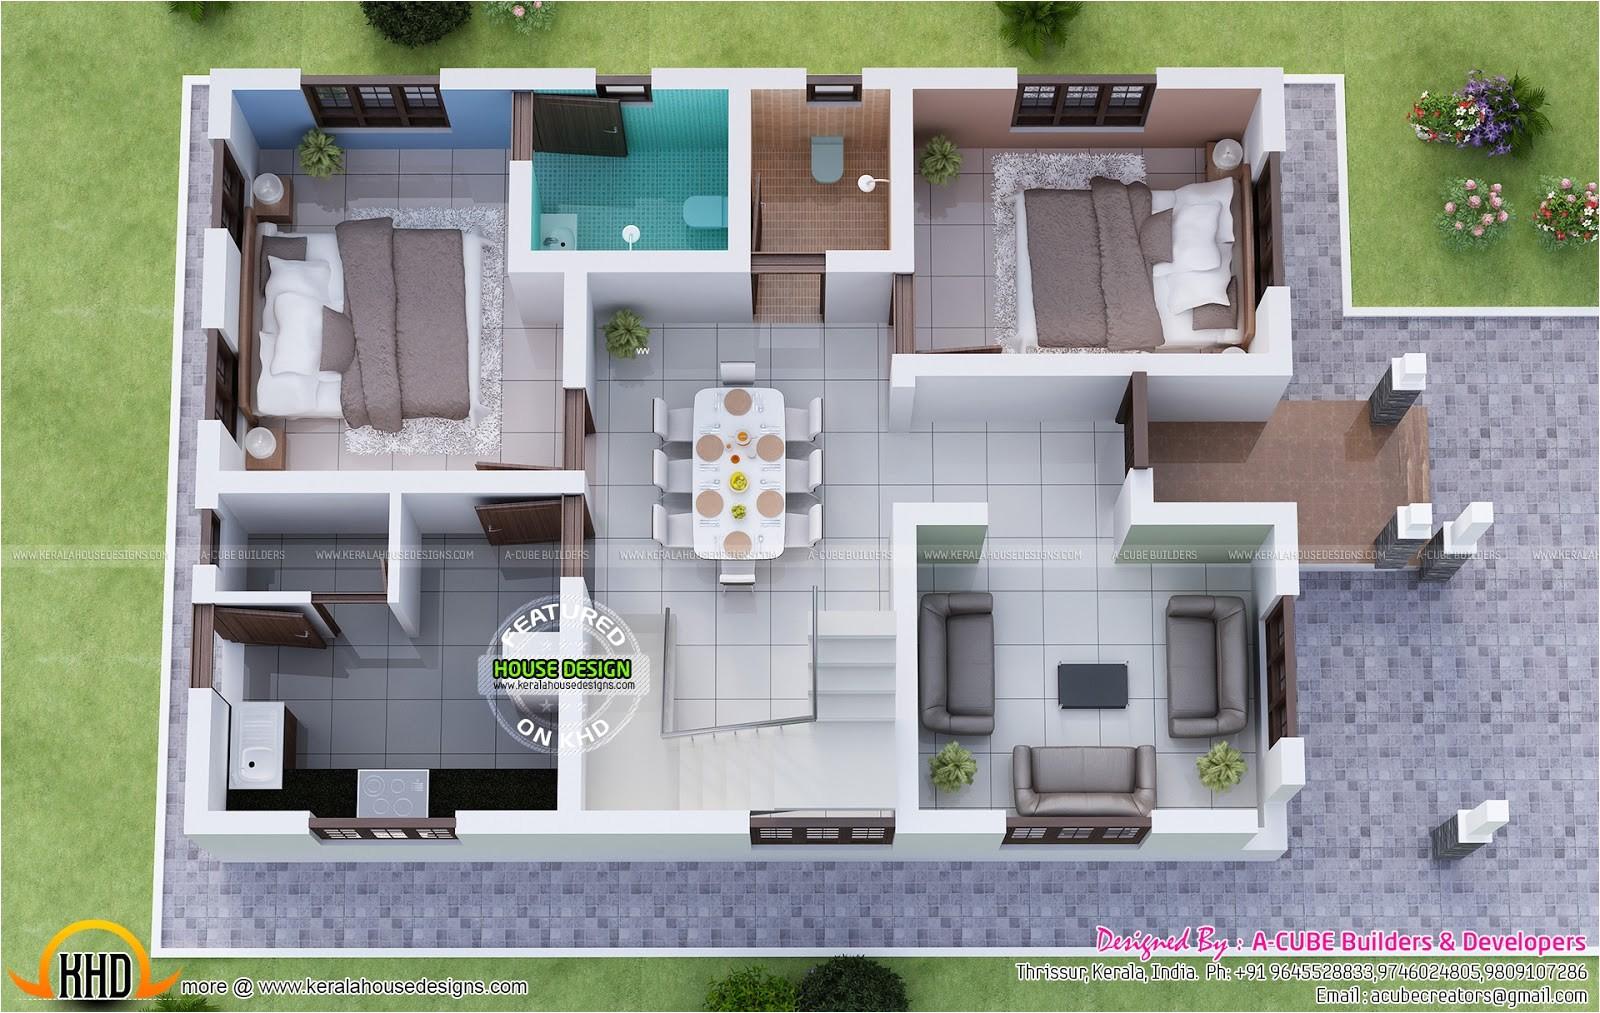 Dream Plan Home Design Magnificent Kerala Dream Home Kerala Home Design and